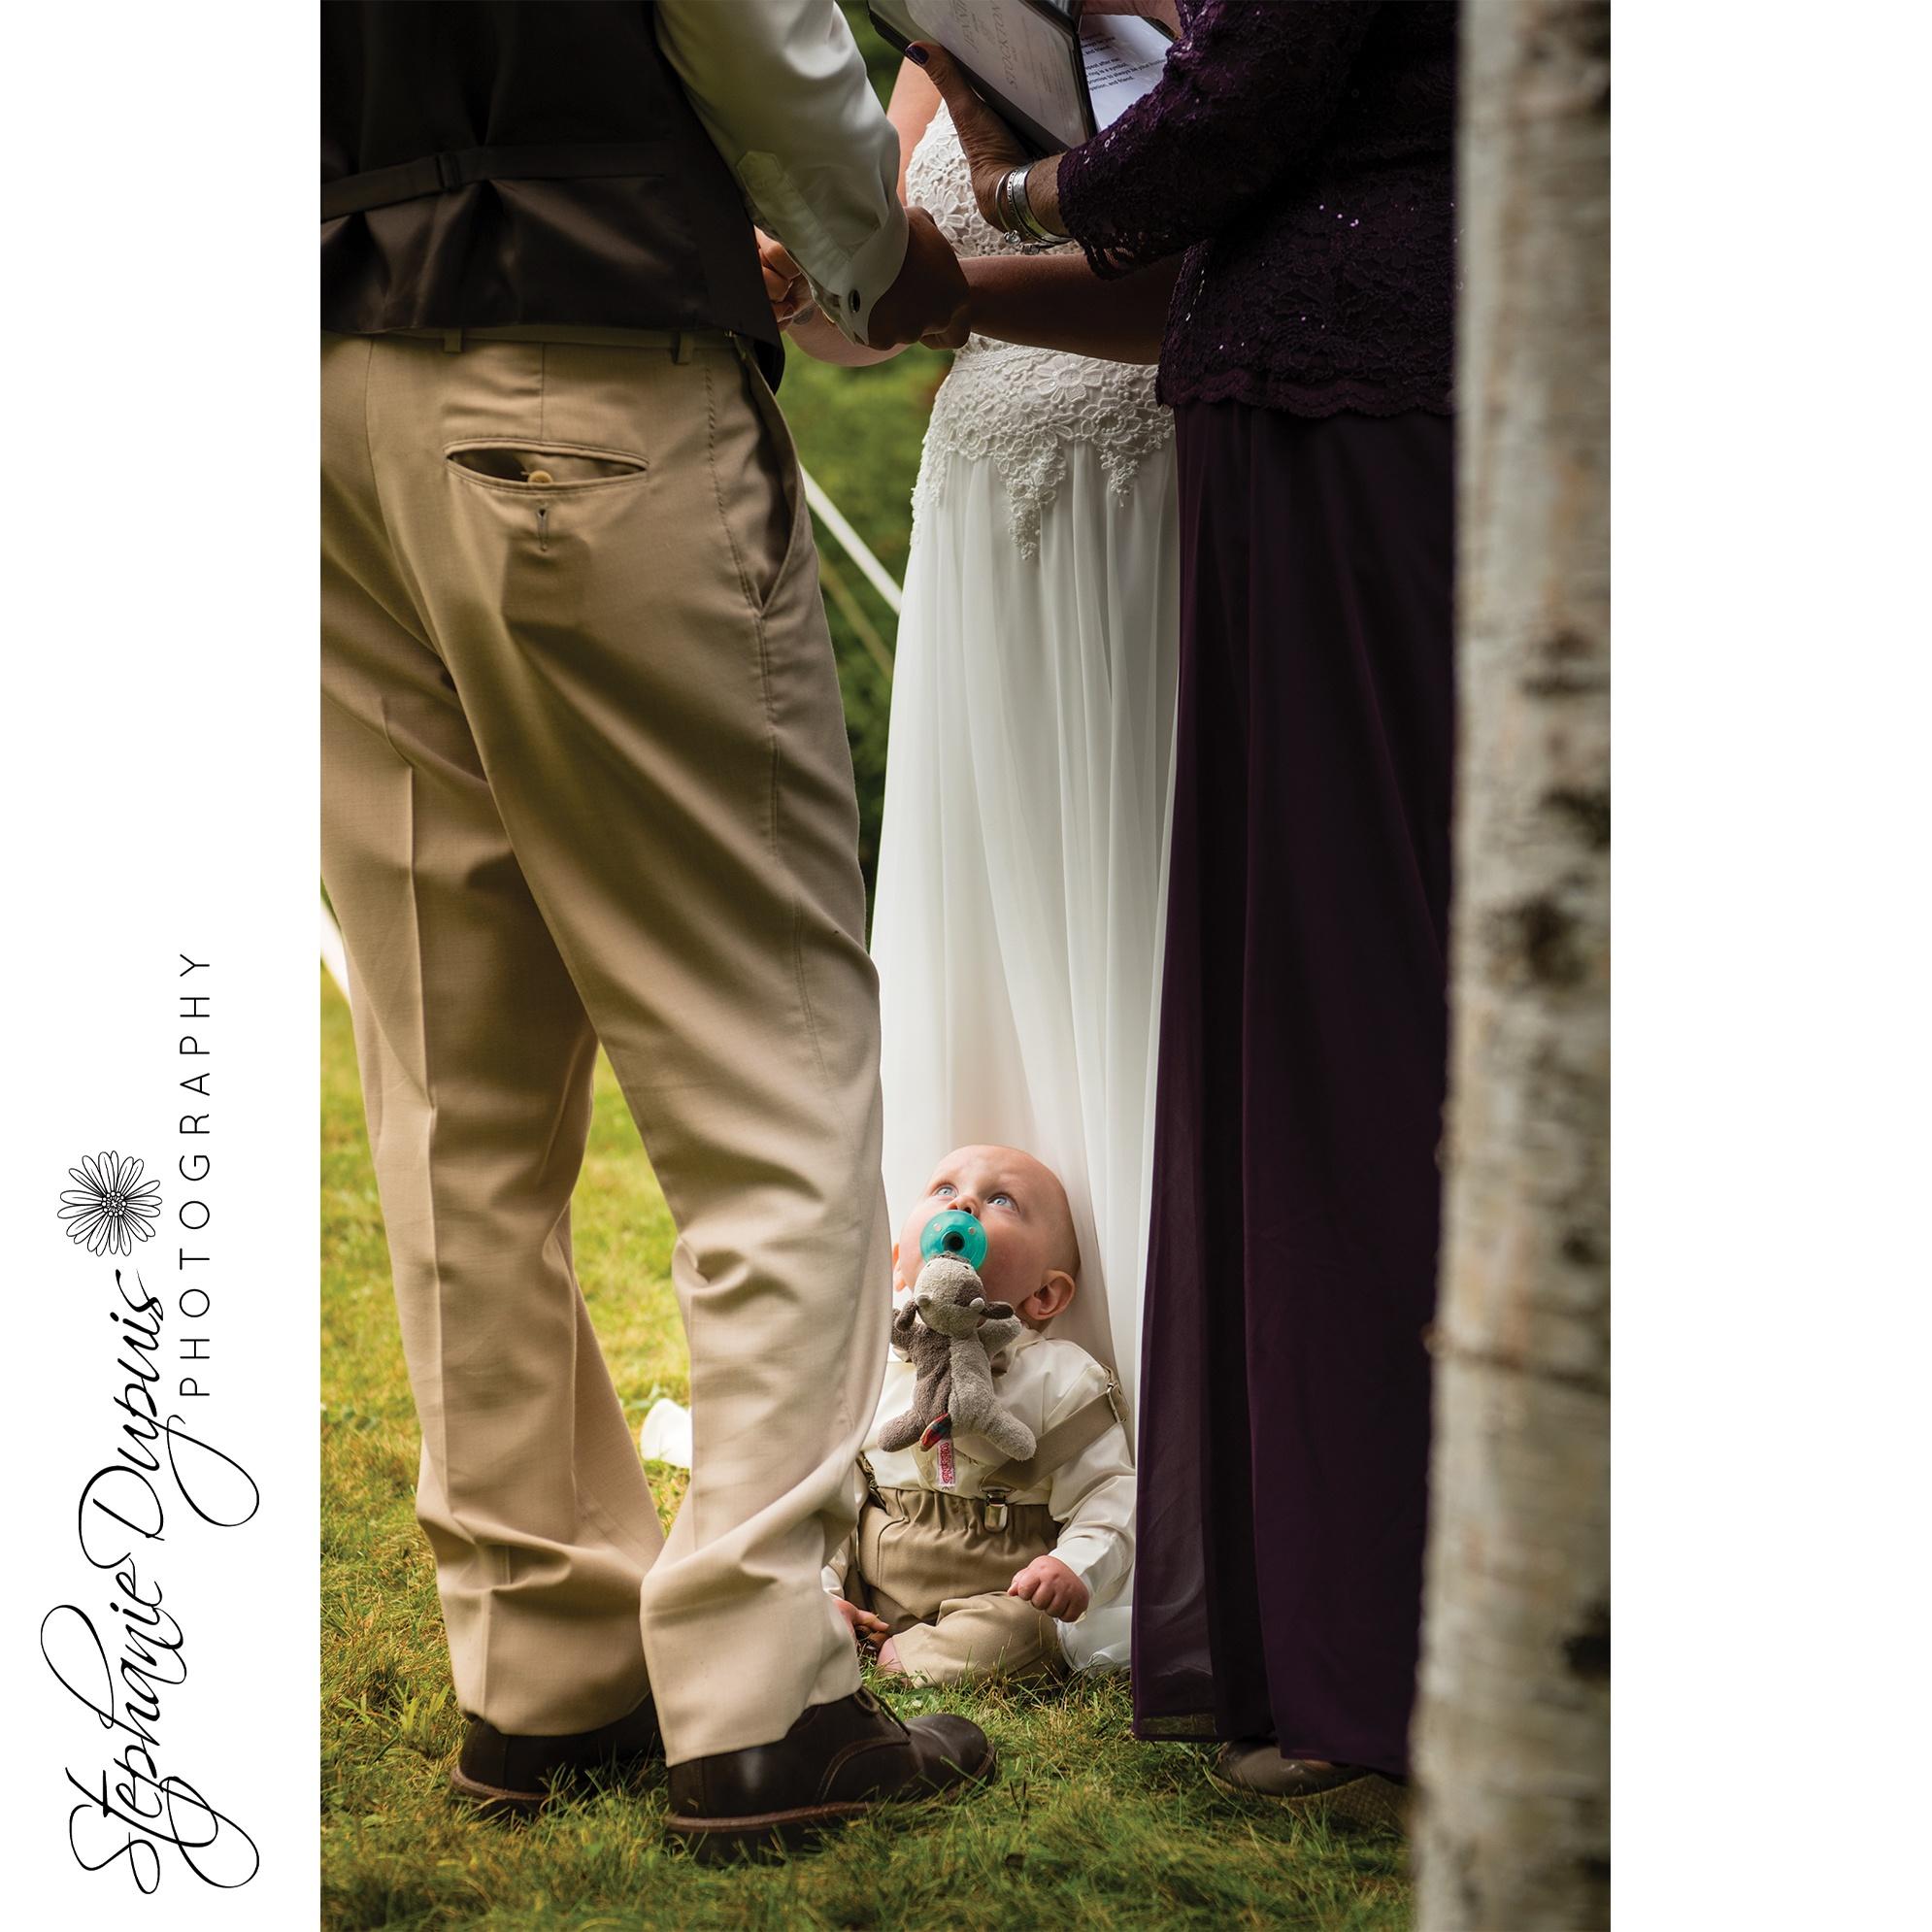 Hicks Wedding 9 - Portfolio: Hick's Wedding